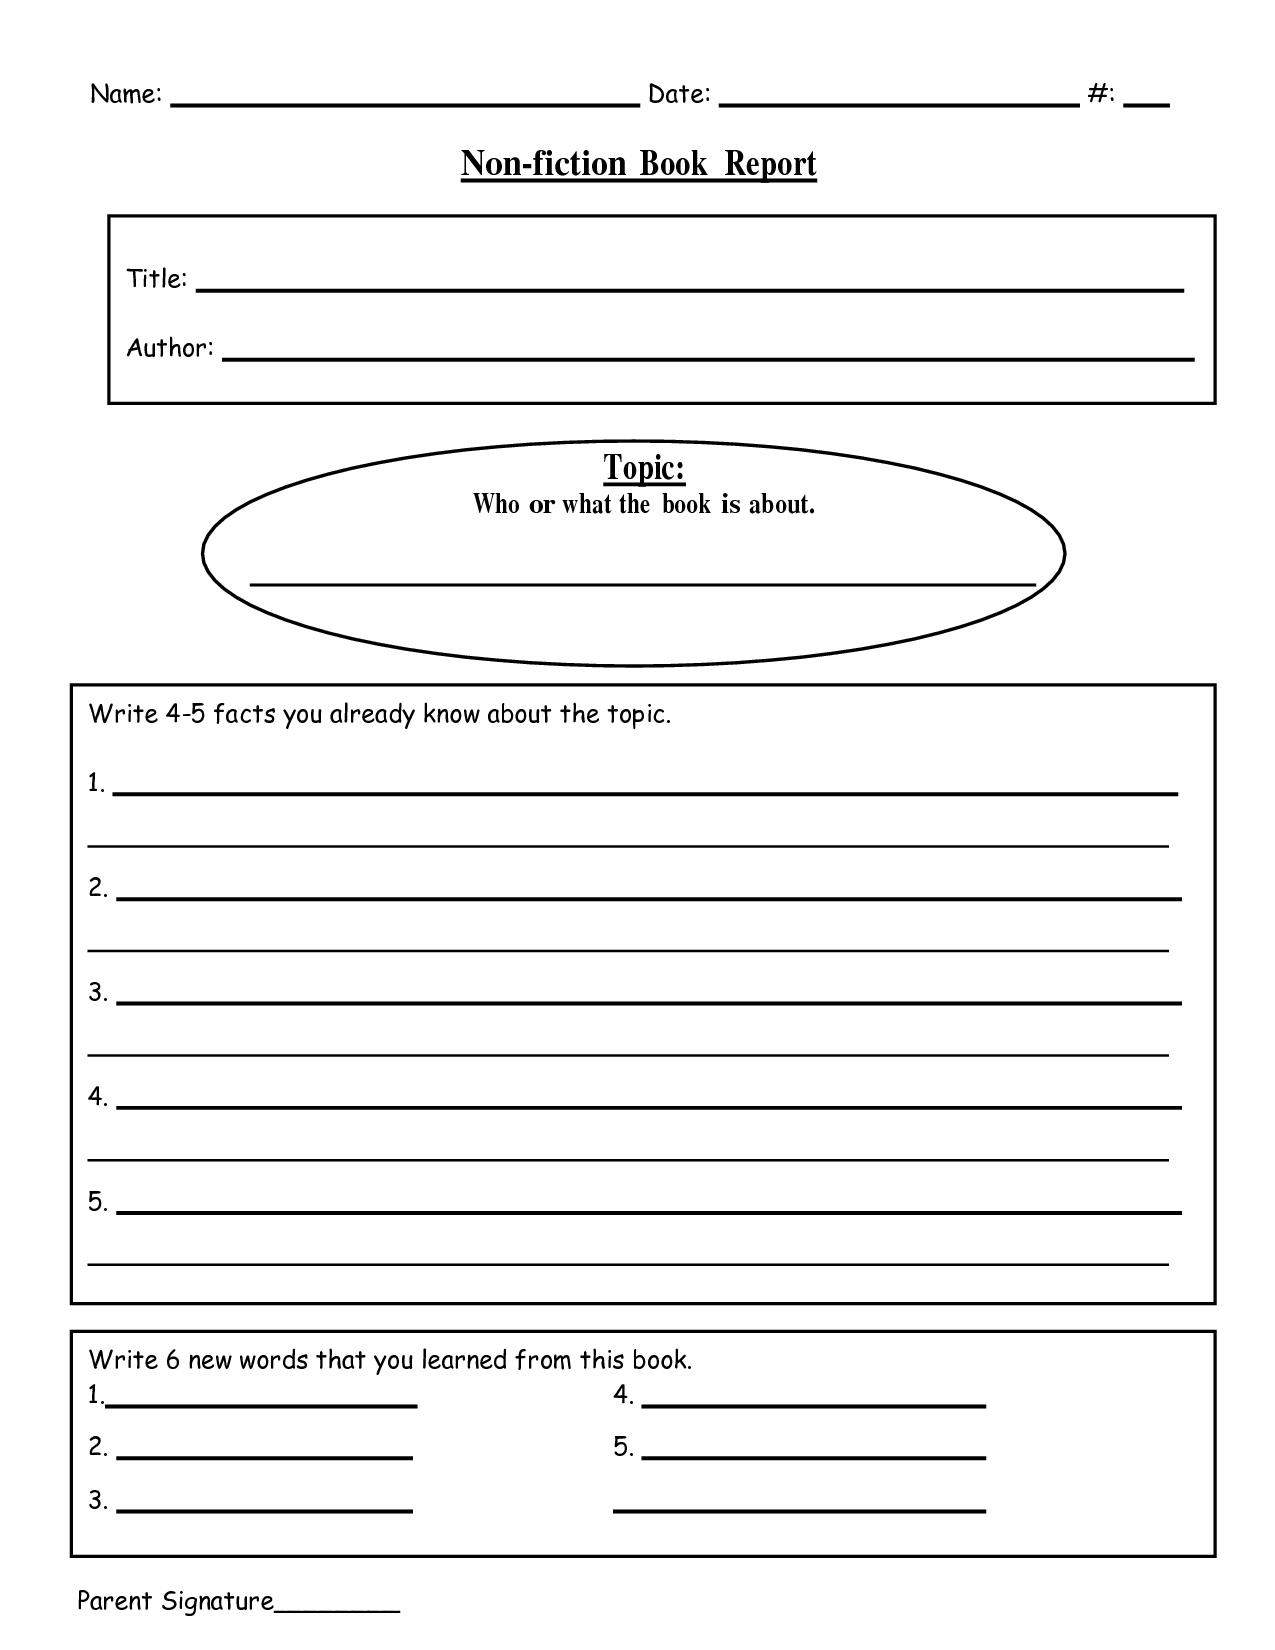 10 Elegant Middle School Book Report Ideas free printable book report templates non fiction book report doc 2 2021